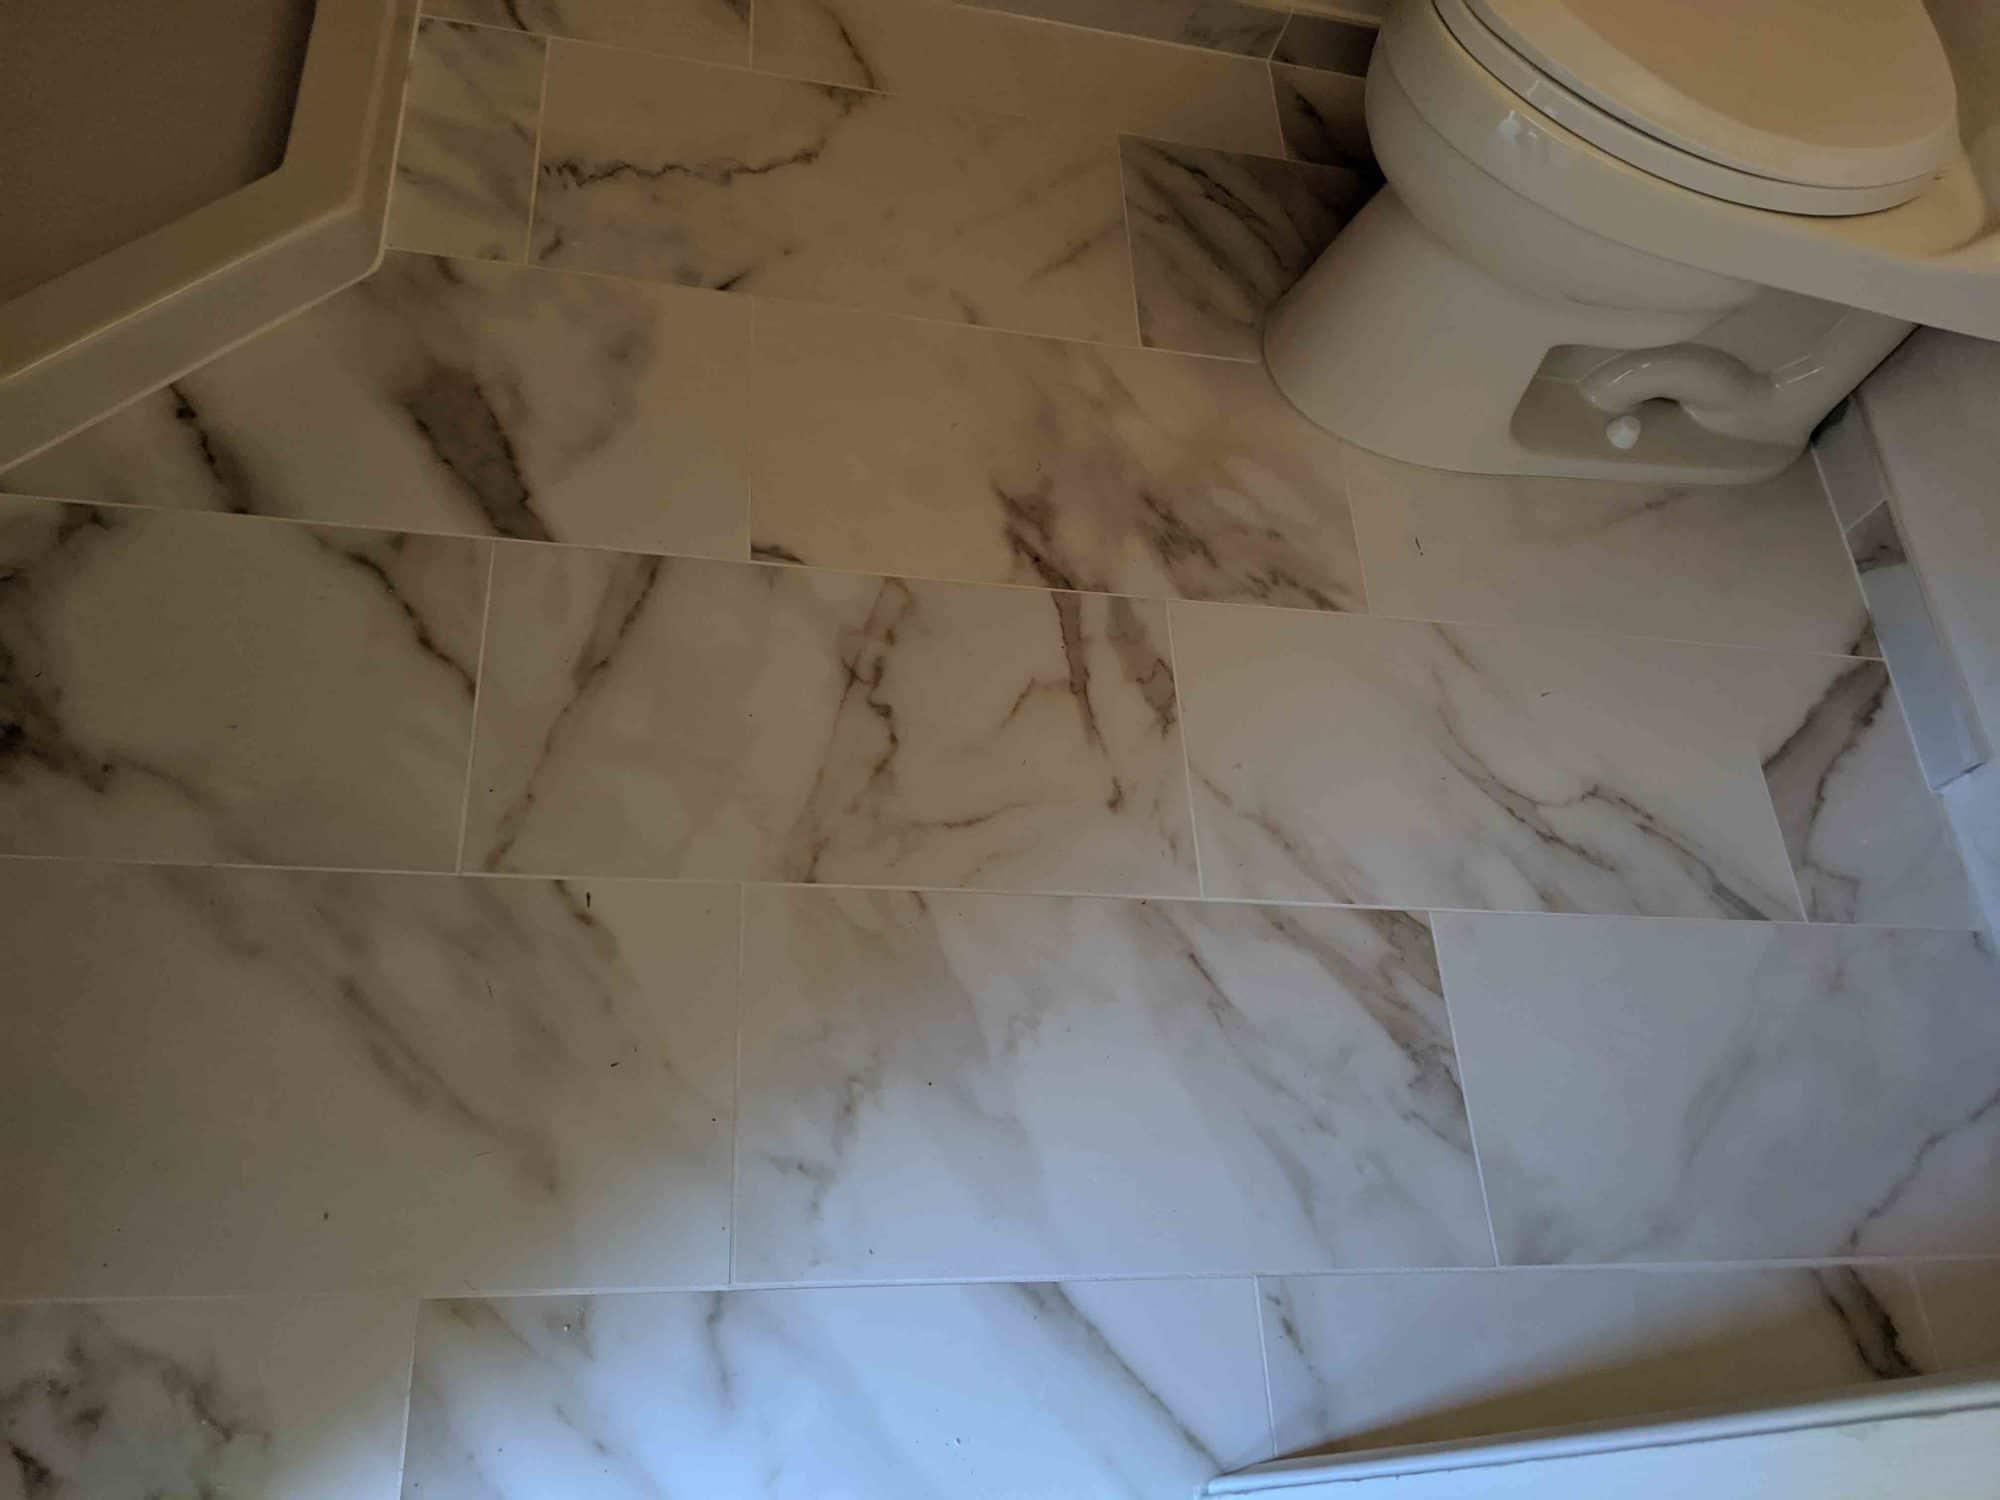 12x24 polished porcelain tile and fiberglass neo angle shower pan And tile floor.